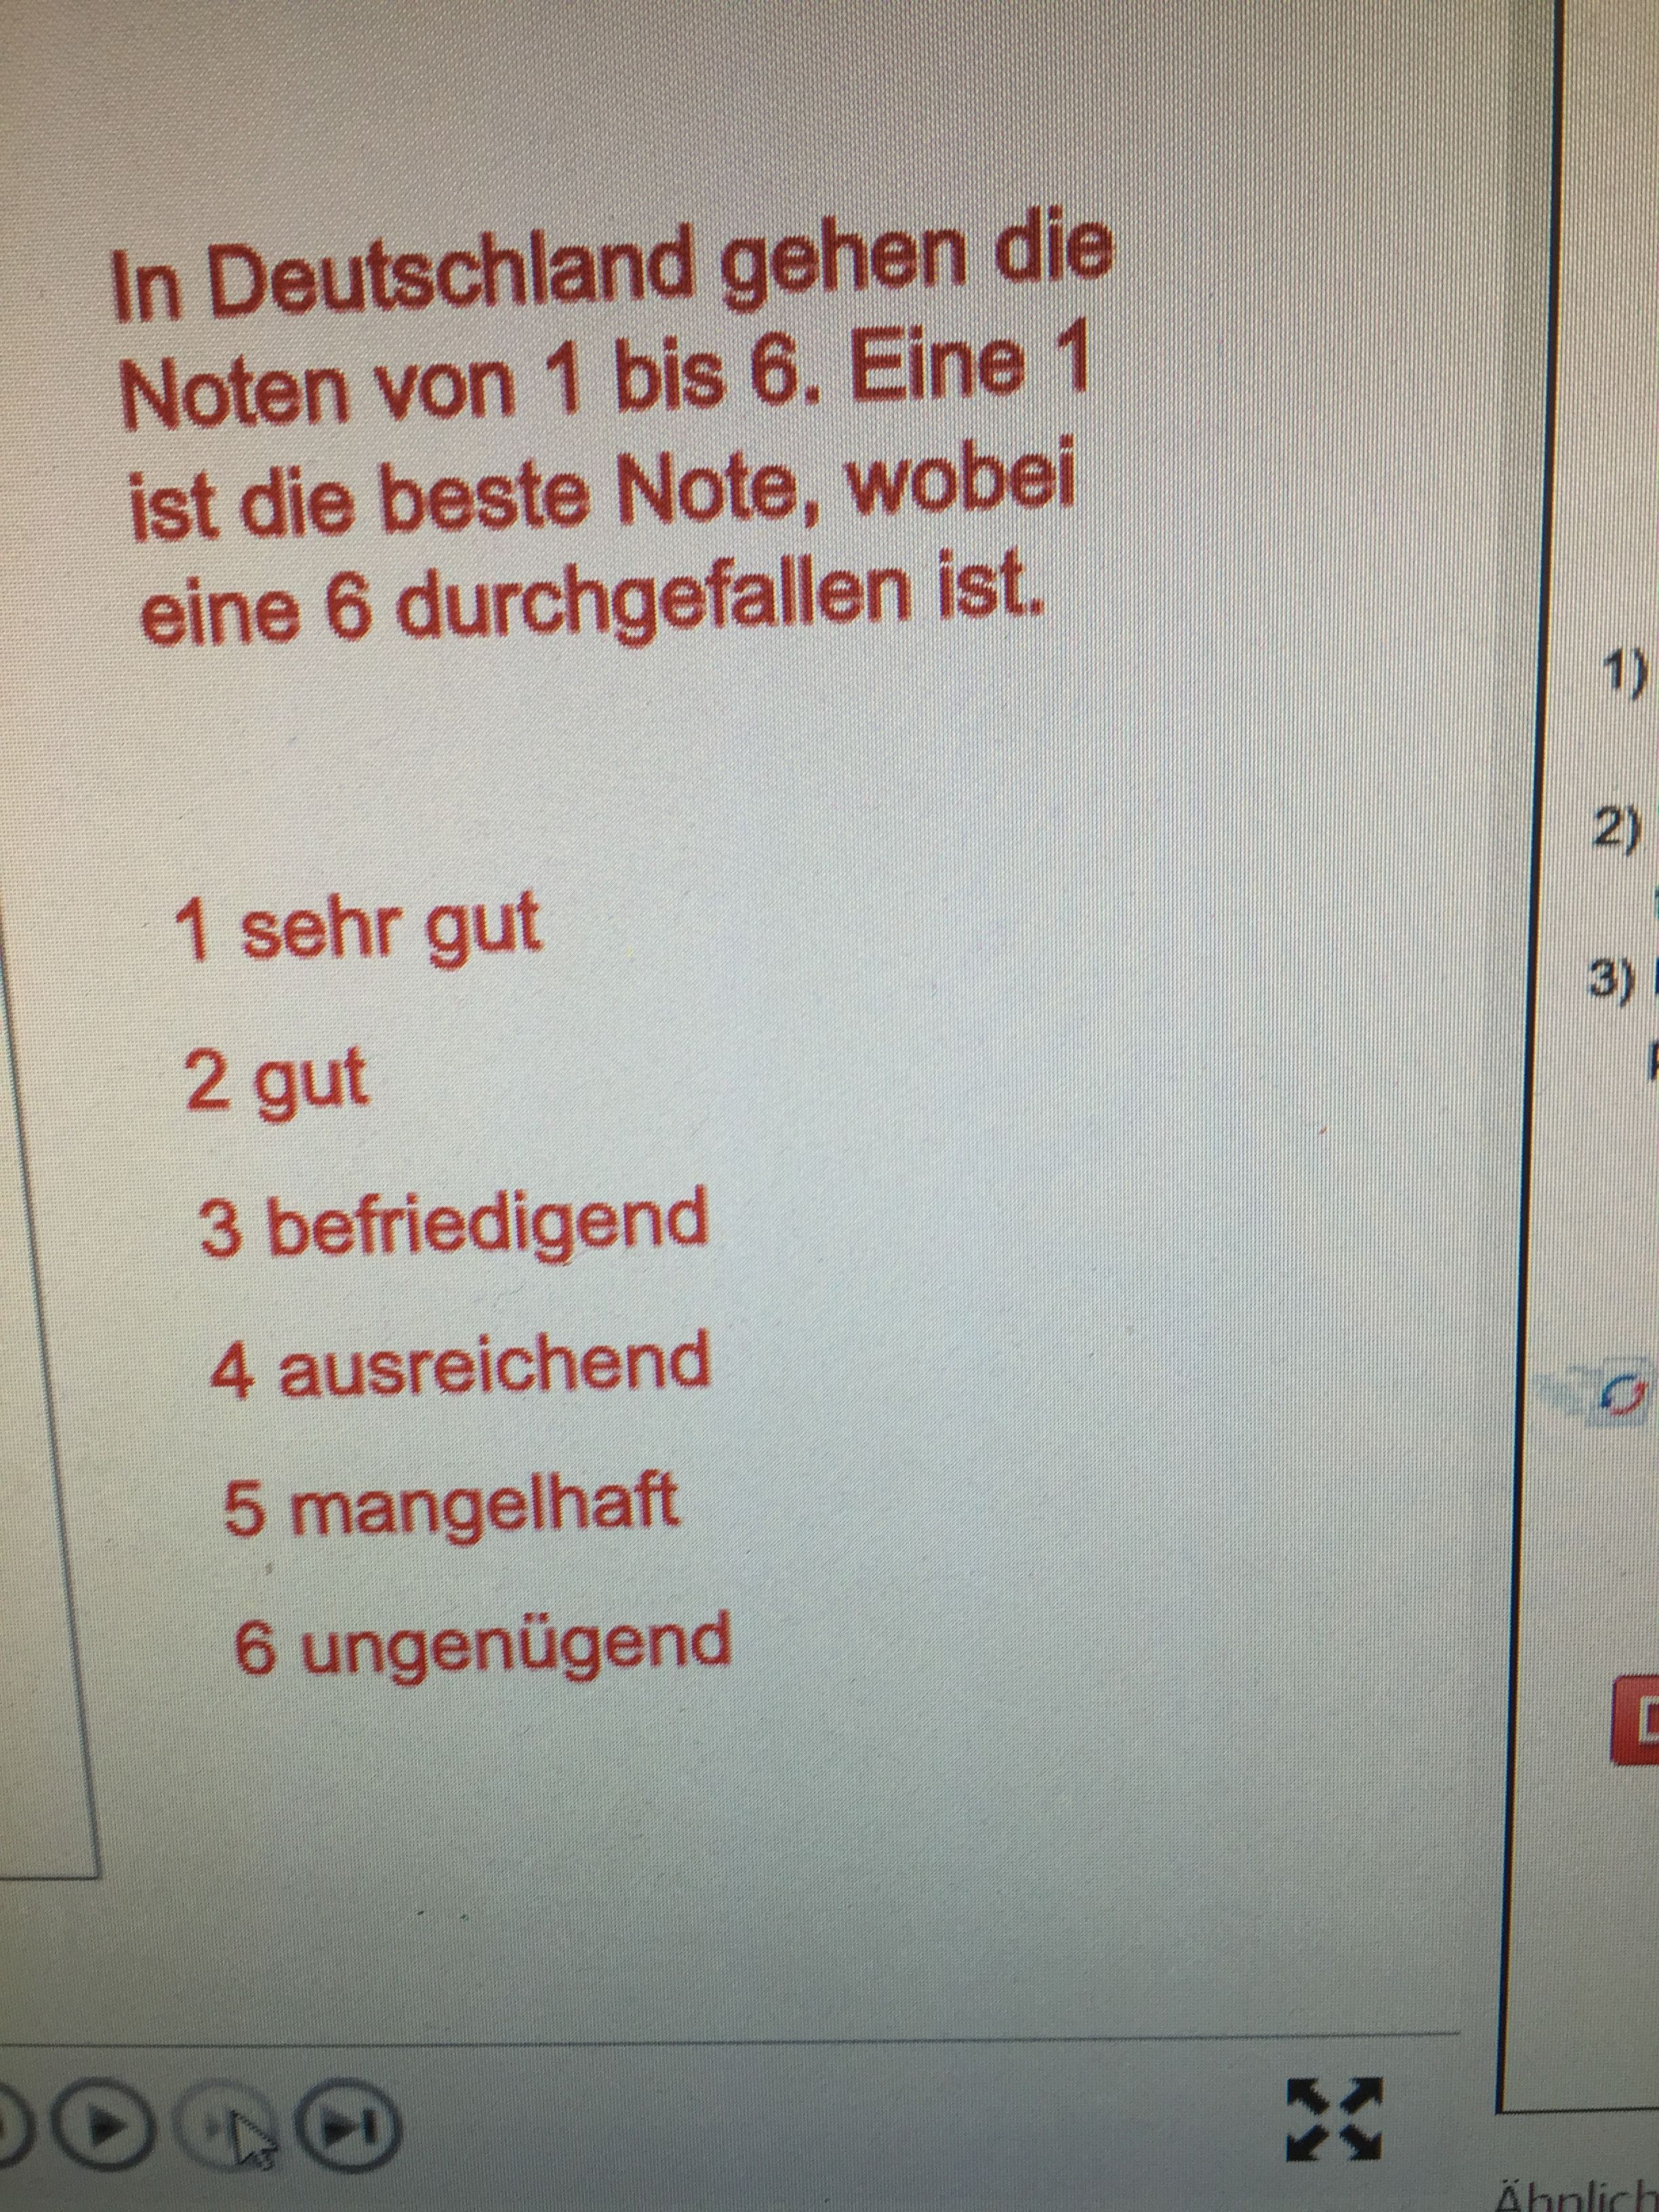 Niedlich Algebra Wortsuche Bedruckbaren Ideen - Gemischte Übungen ...